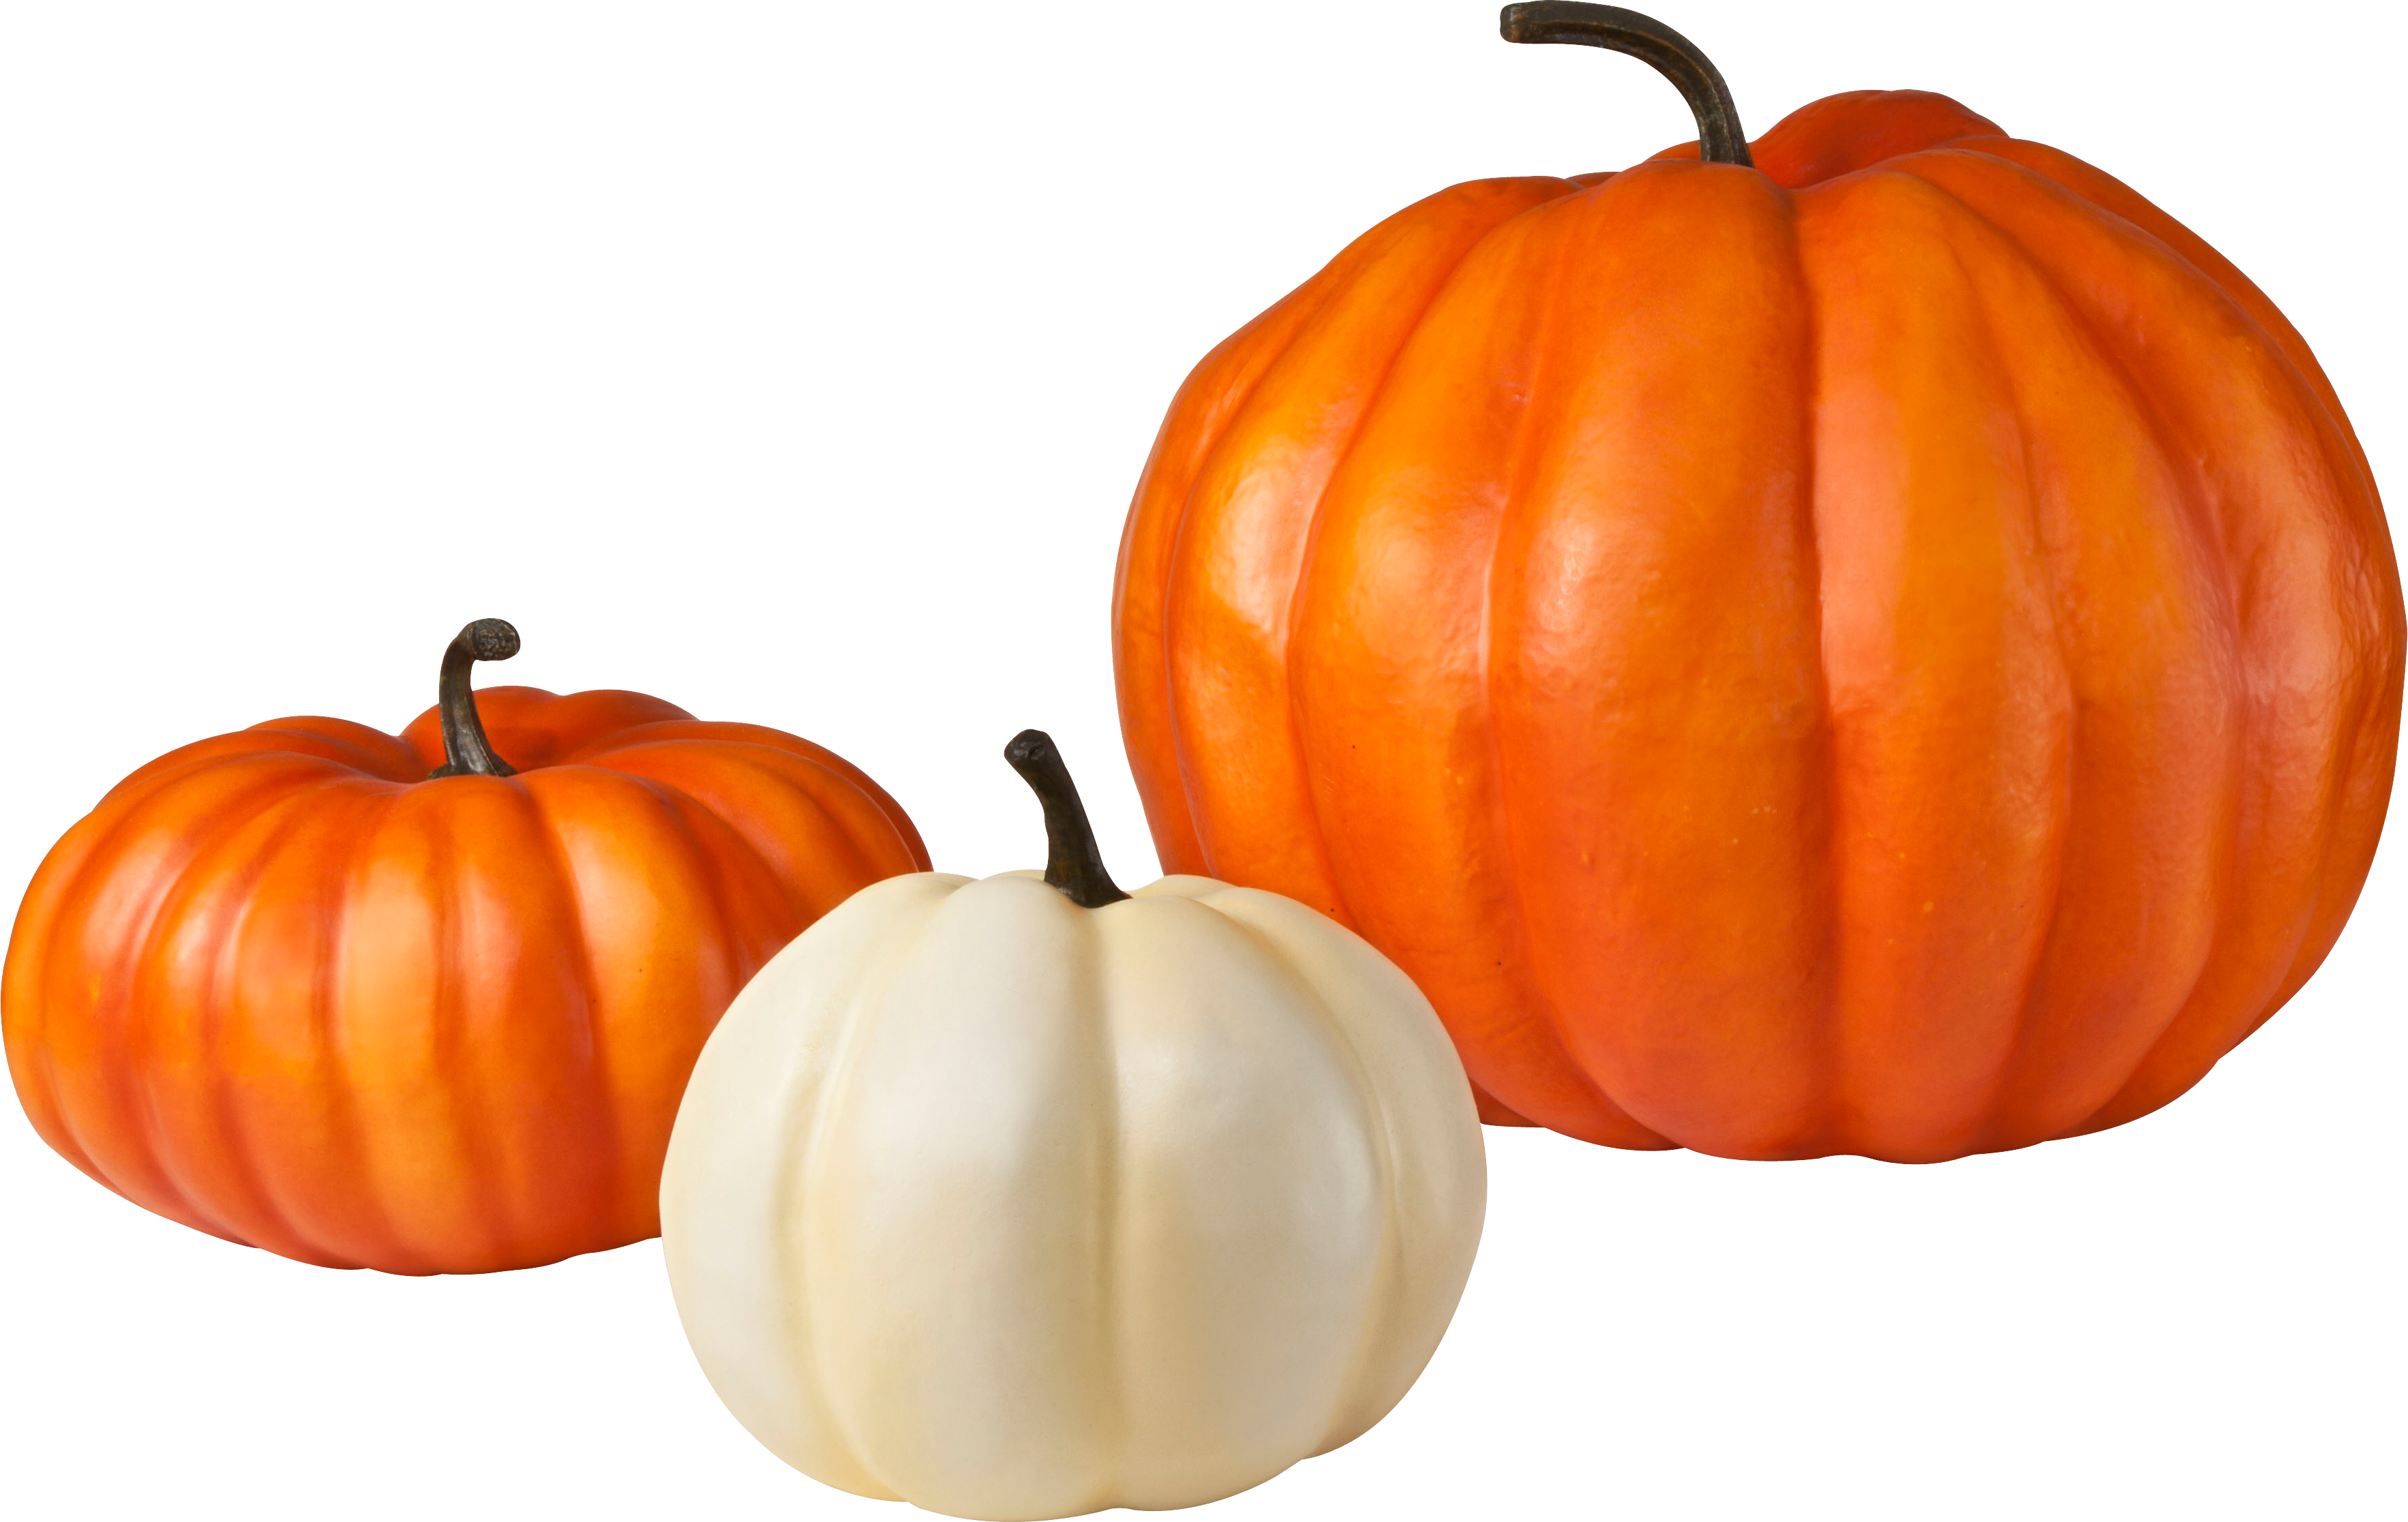 Pumpkin PNG - 27277